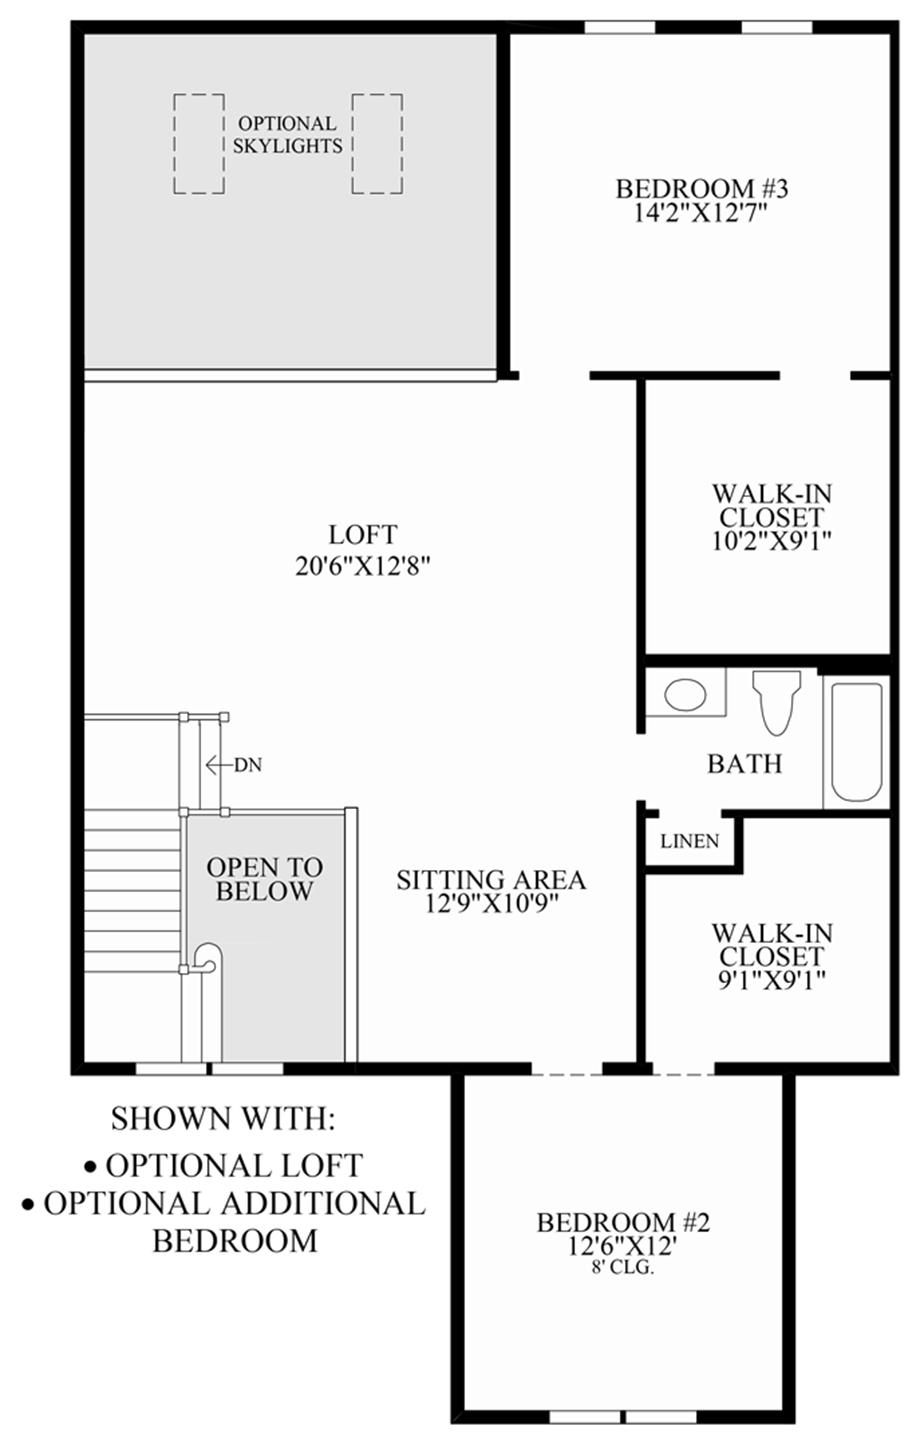 Optional Loft/Additional Bedroom Floor Plan